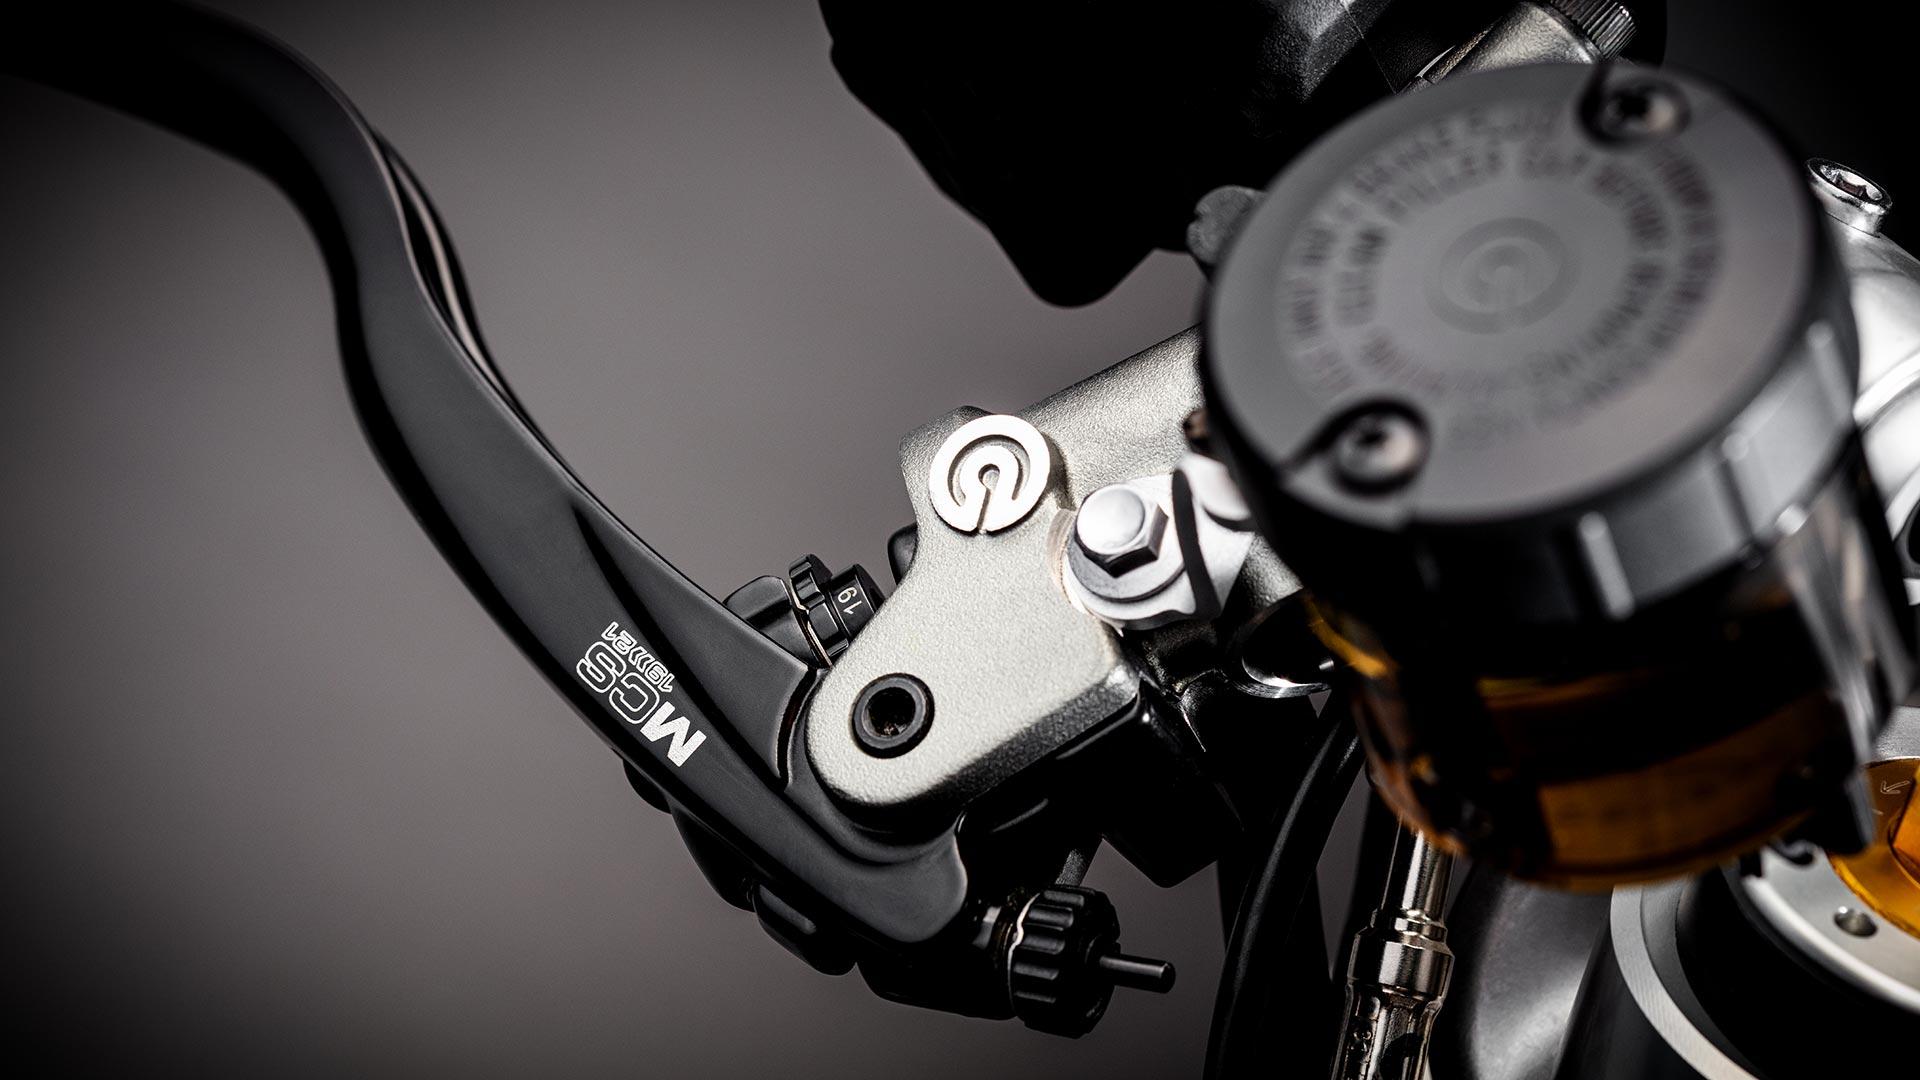 Close-up shot of the Triumph Bobber TFC's front brake lever